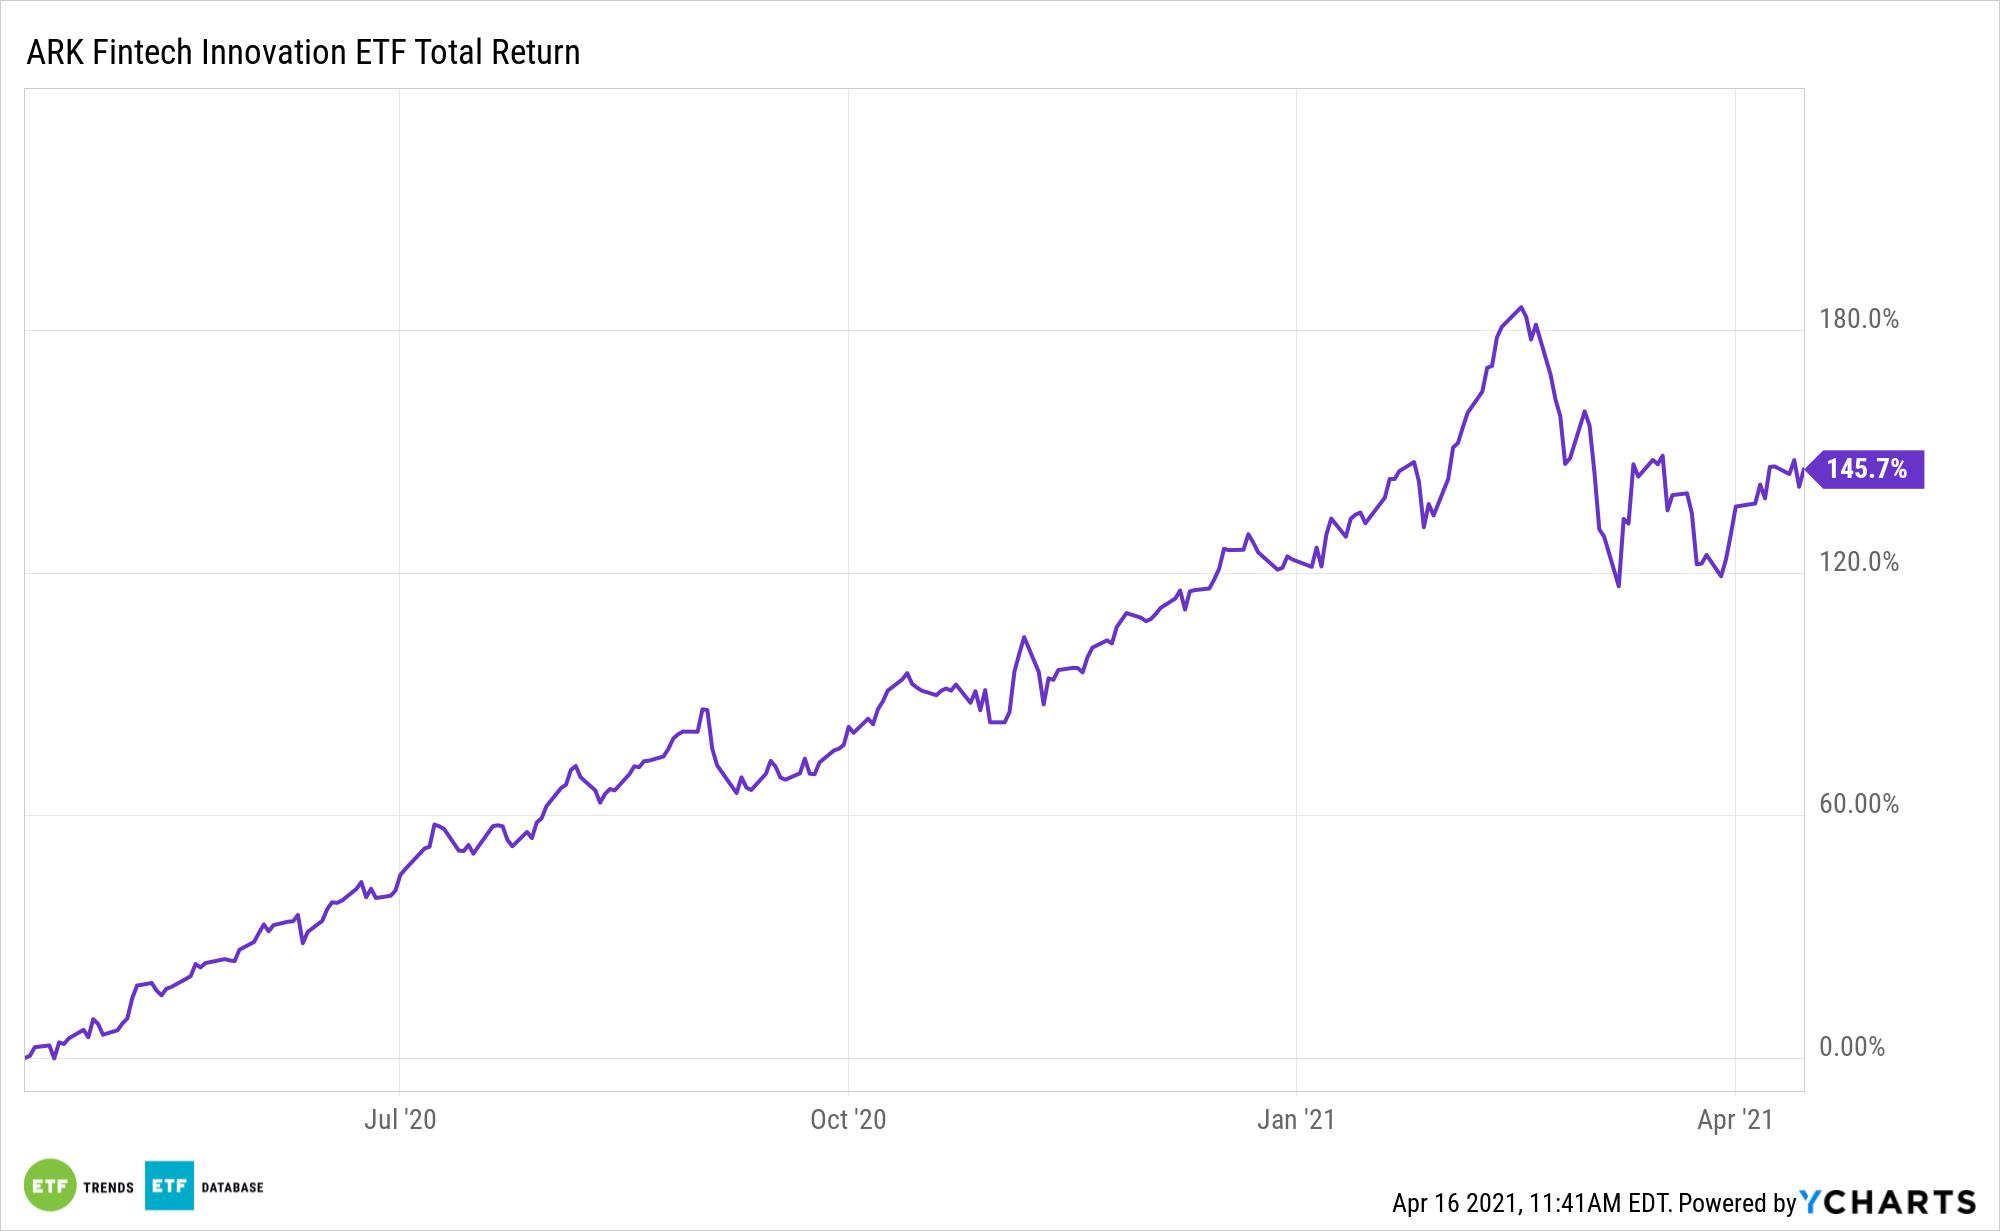 ARKF 1 Year Total Return